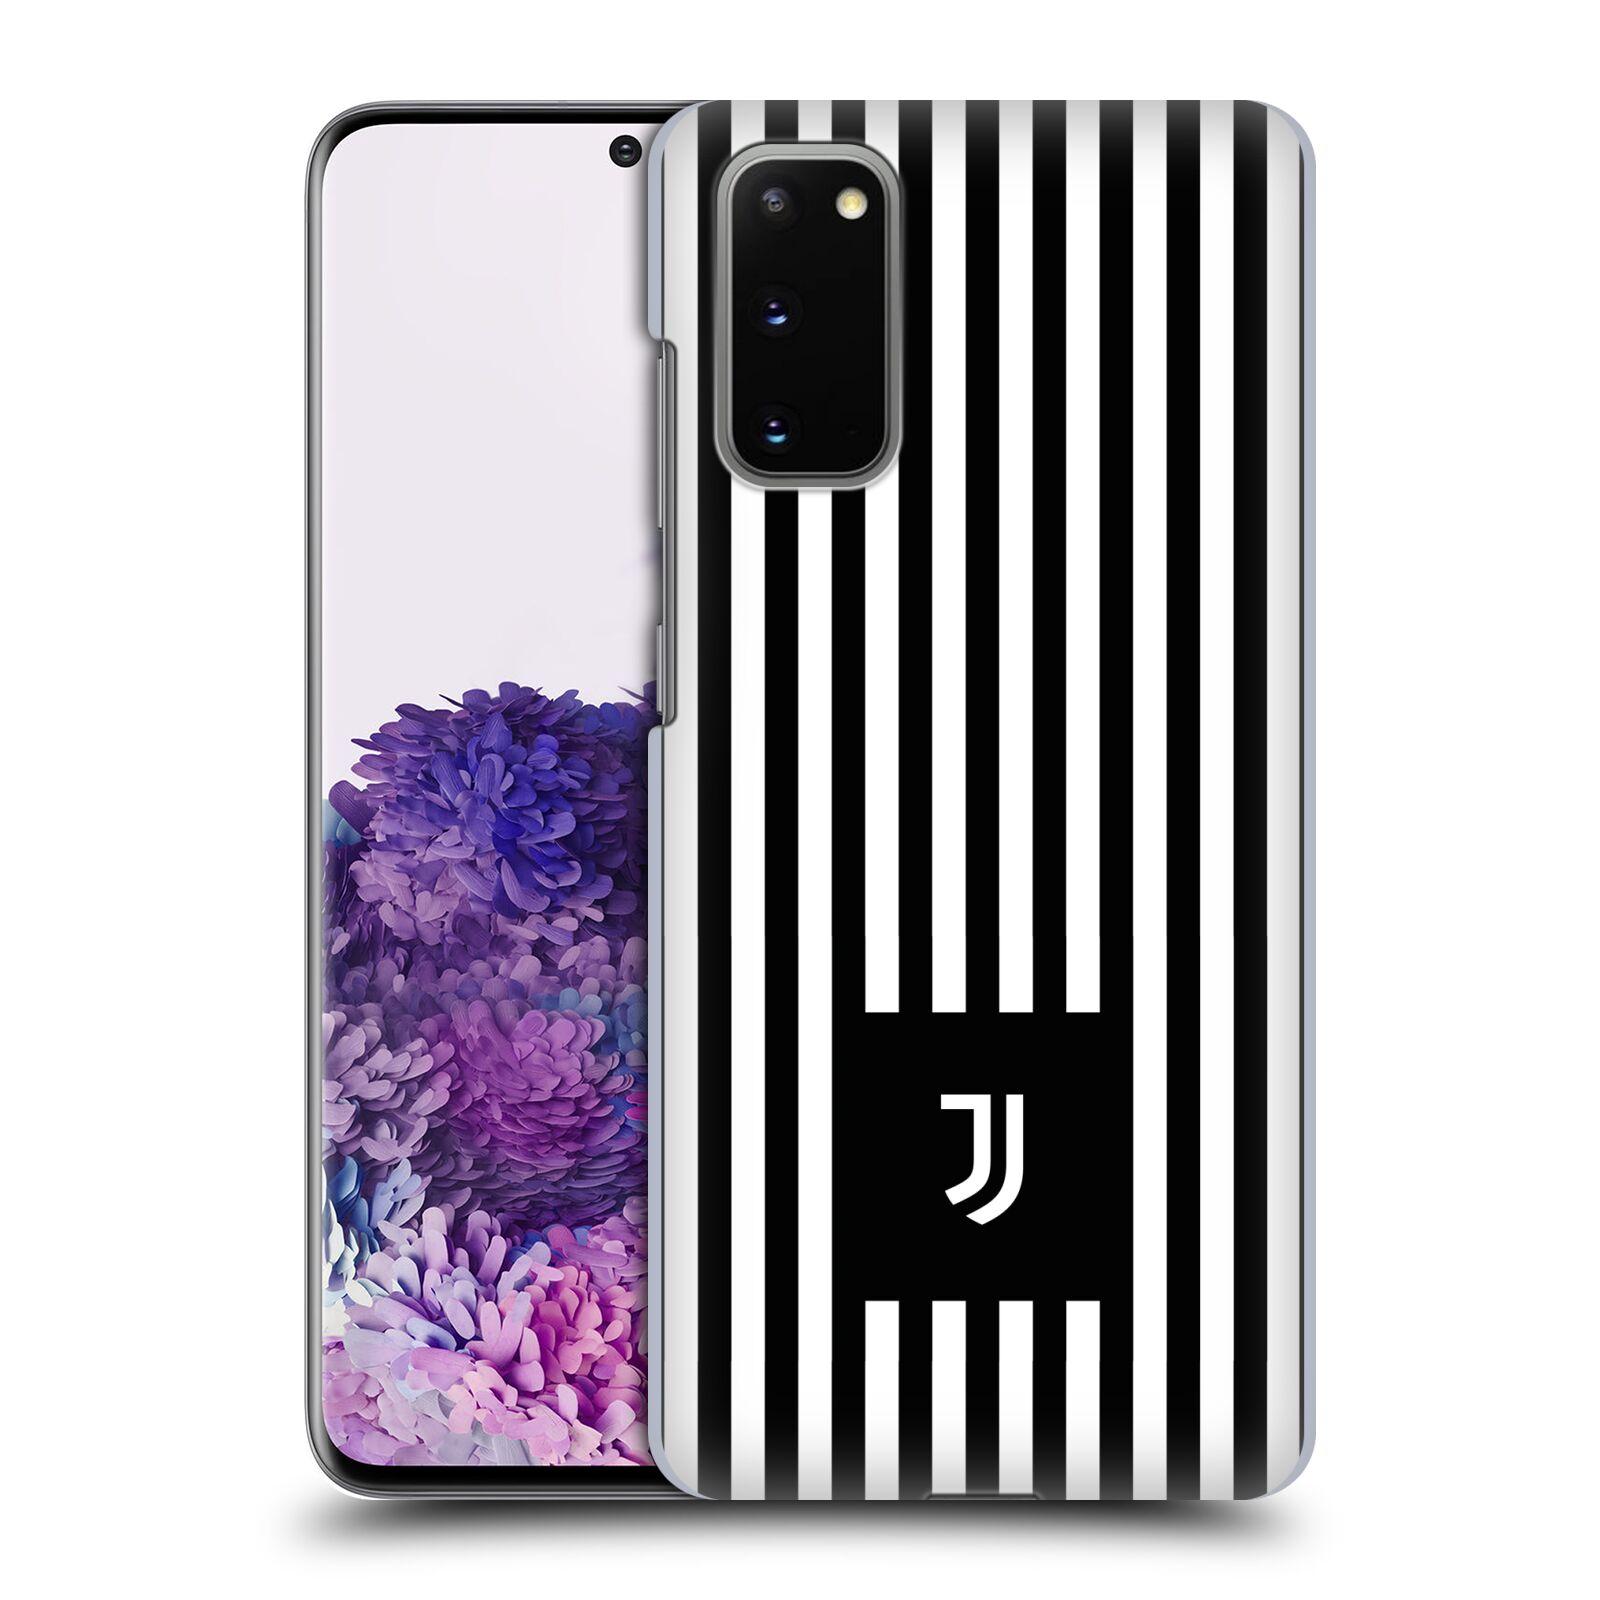 Plastové pouzdro na mobil Samsung Galaxy S20 - Head Case - Juventus FC - Nové logo - Pruhy